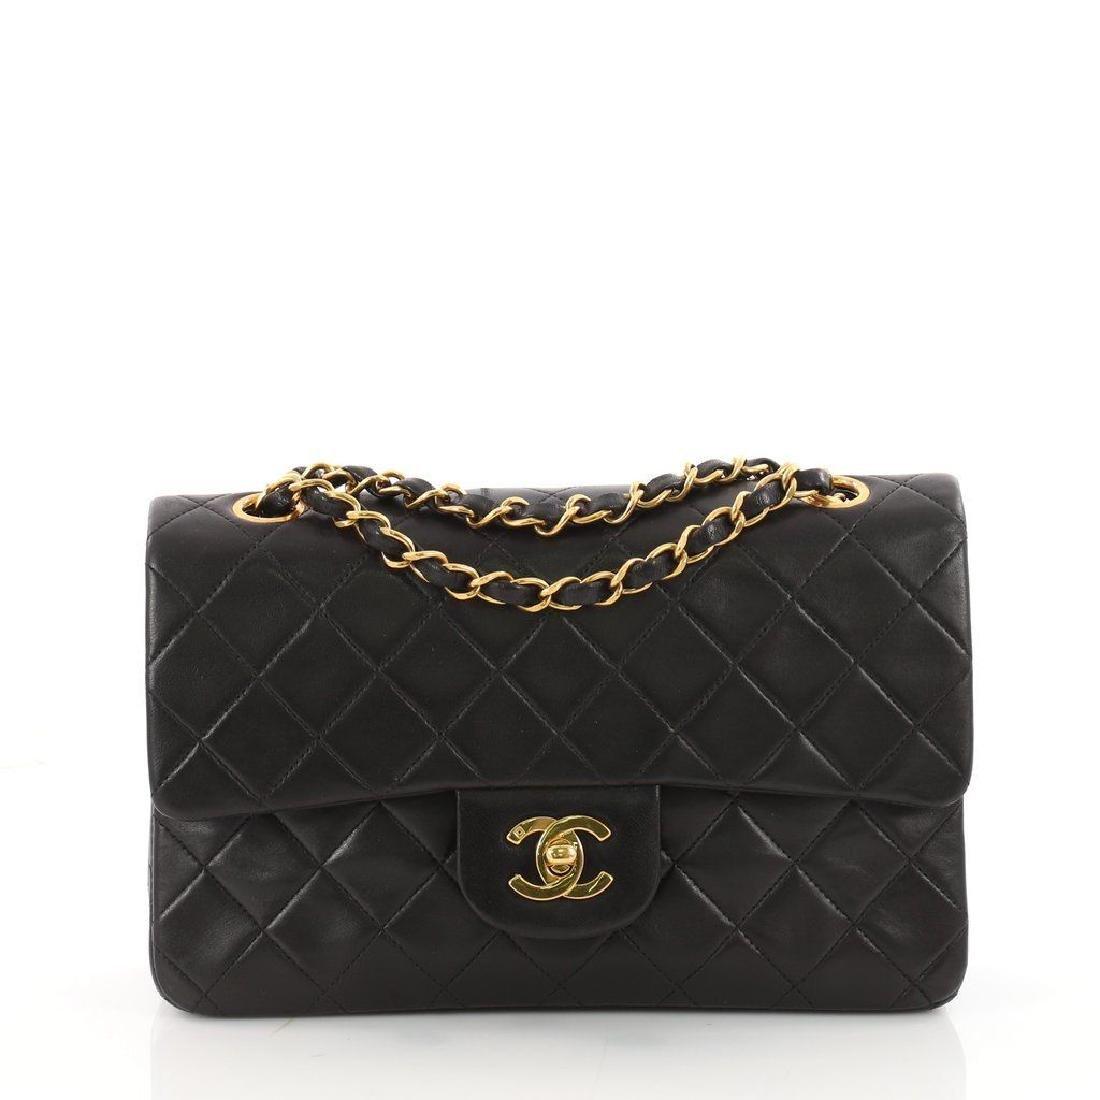 Chanel Double Flap Classic Shoulder Bag Black Lambskin - 2